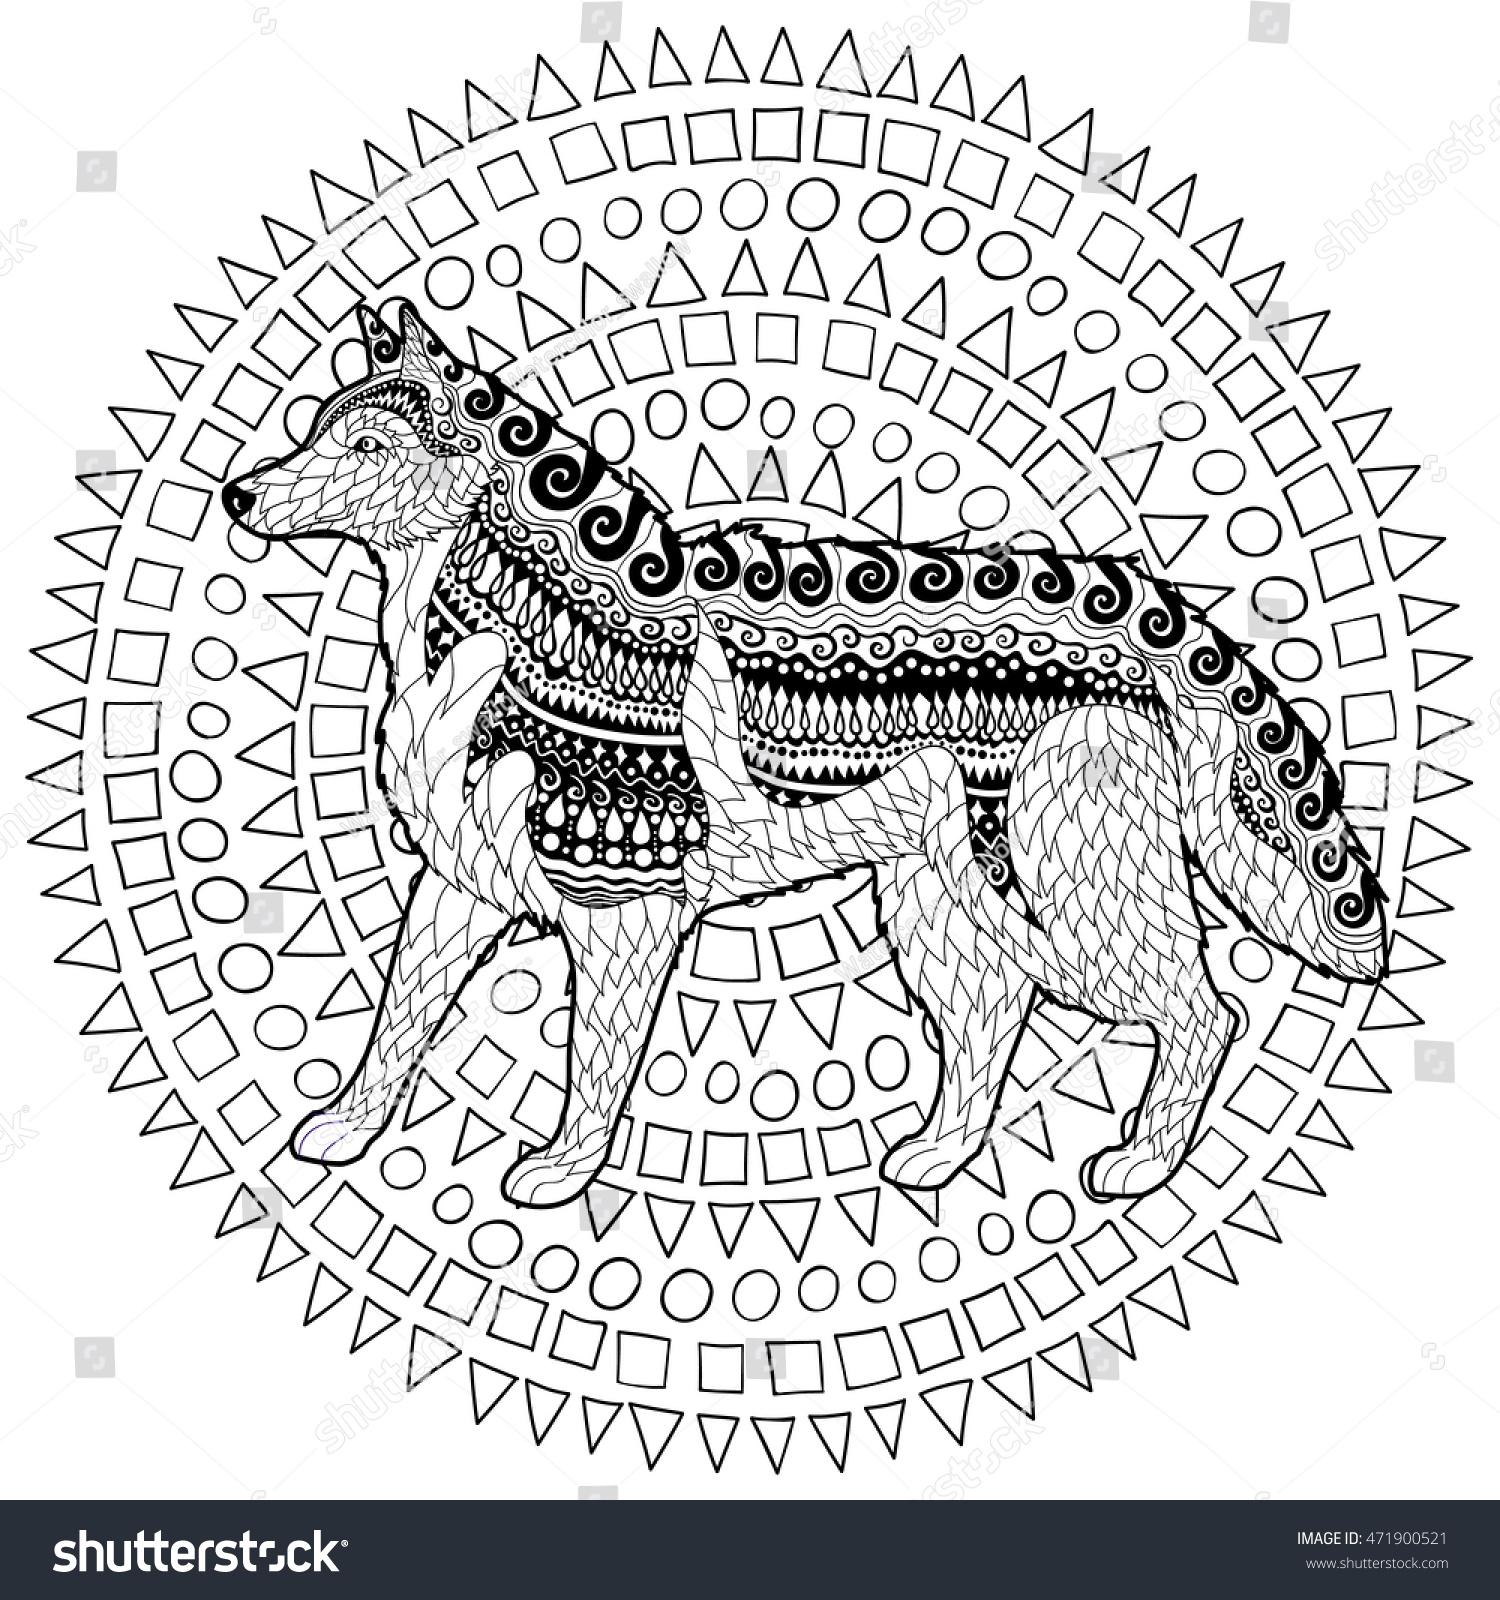 Royalty Free Stock Illustration of Siberian Husky High Details Adult ...